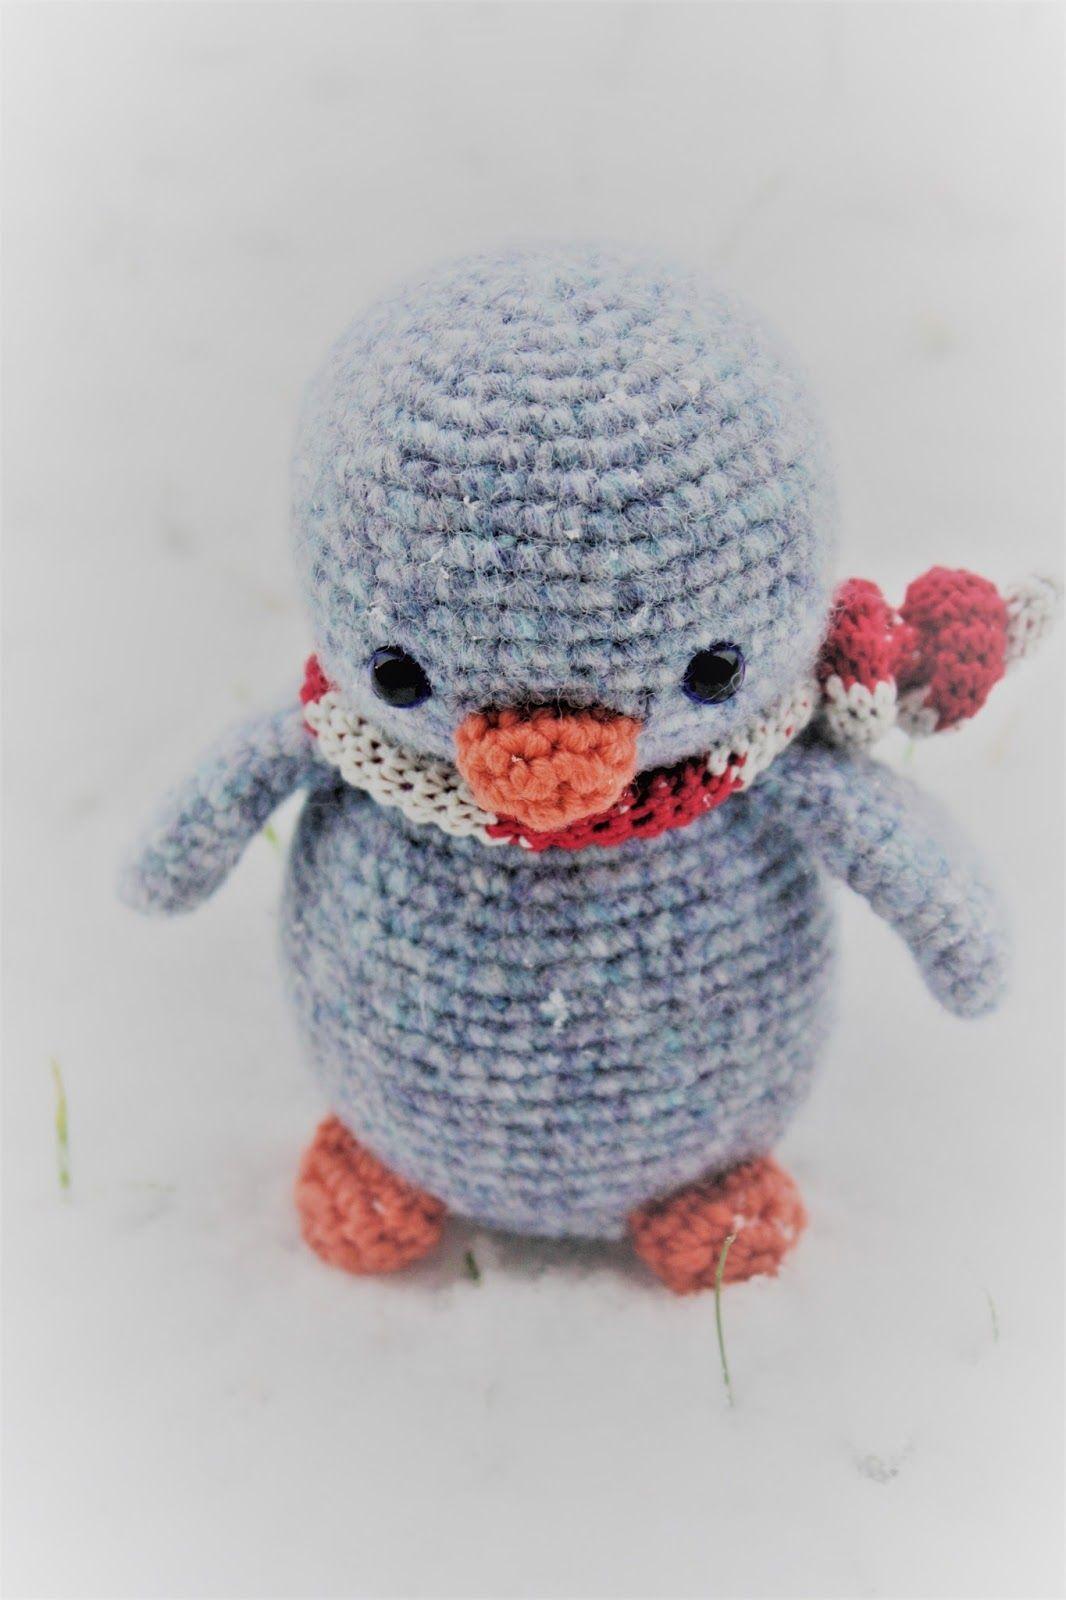 Amigurumi patterns, crochet tutorials, handmade toys   amigurumis ...